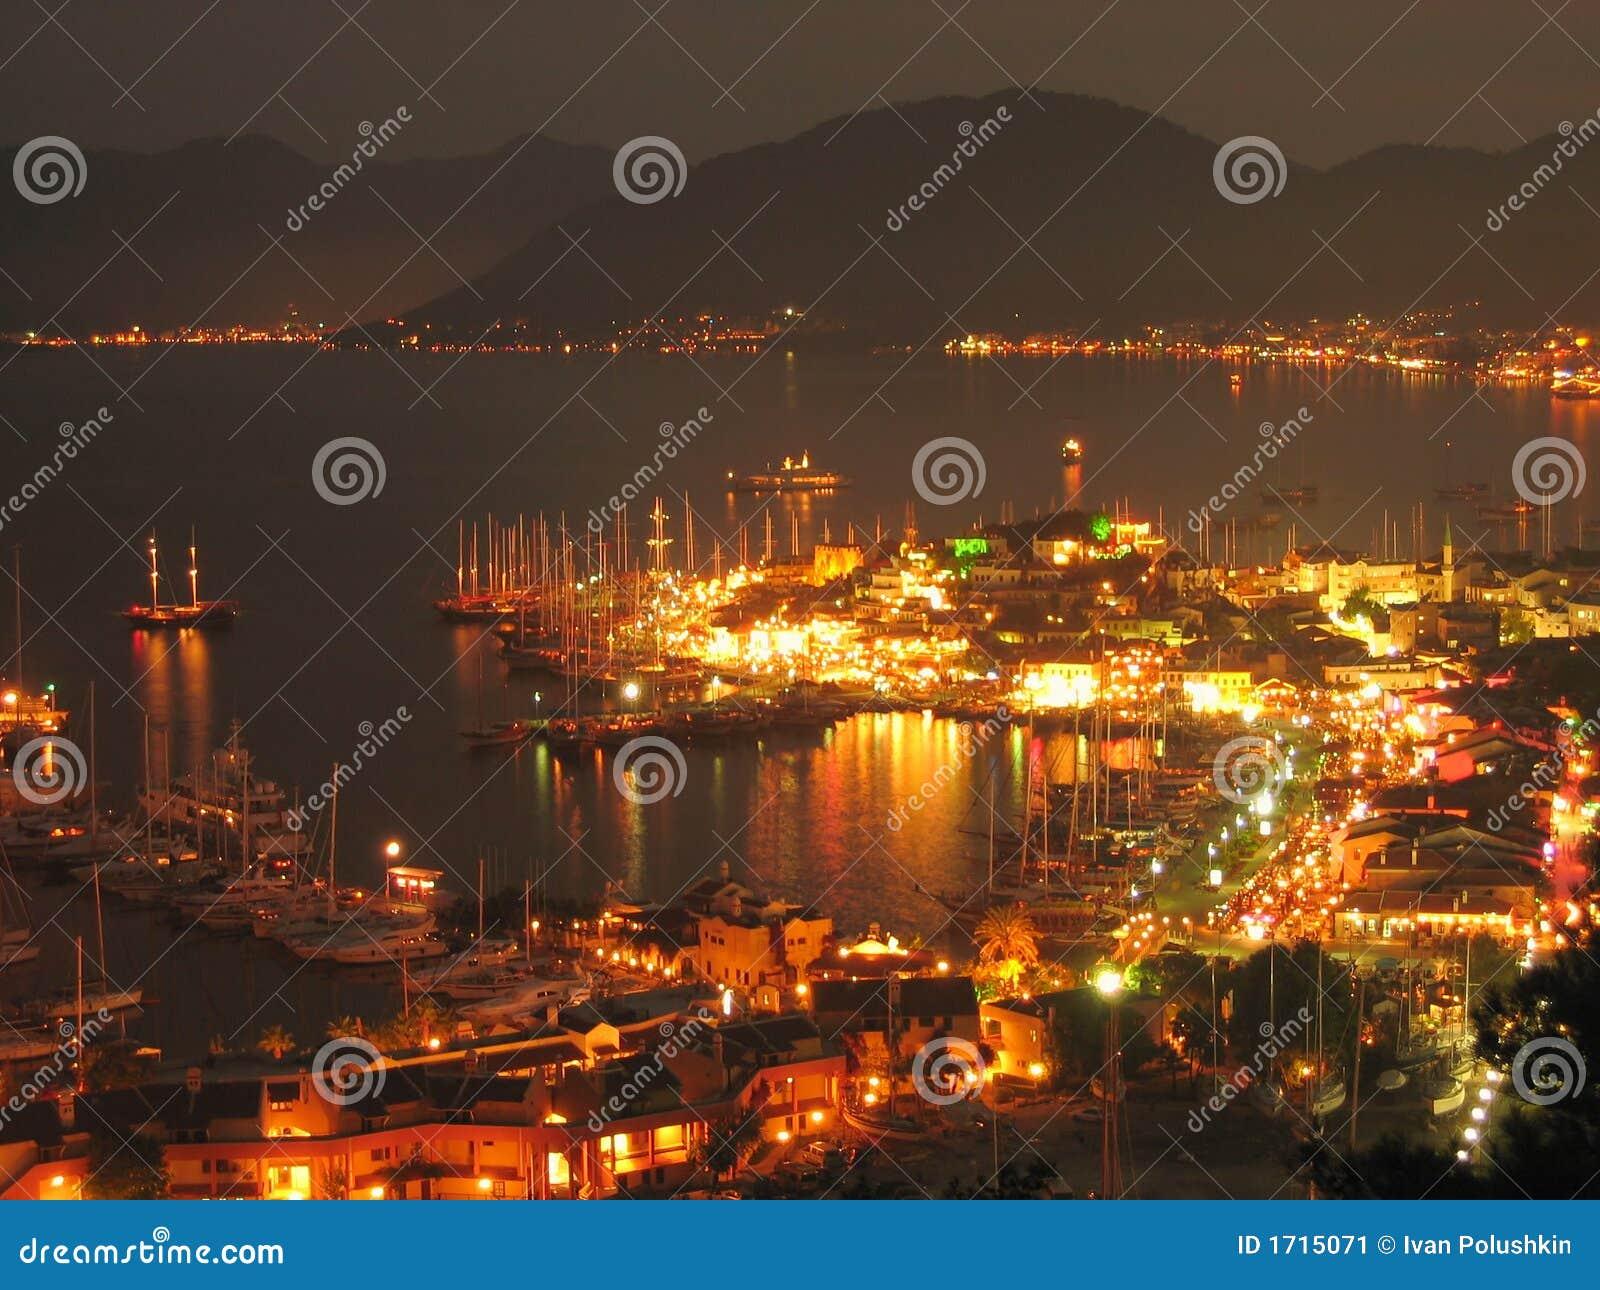 Sailboats anchored in harbor night scene